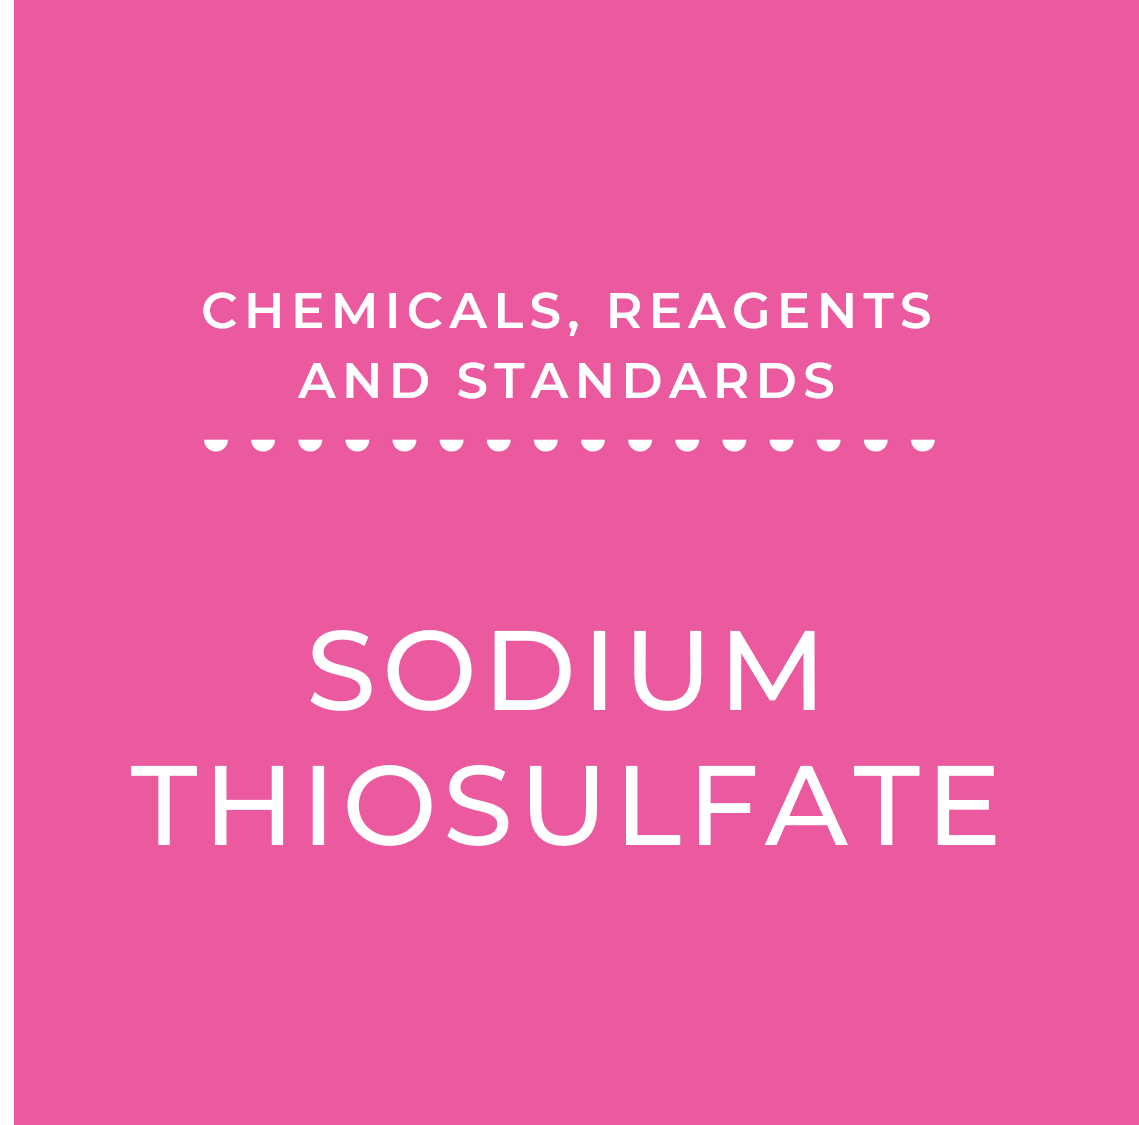 0.02N Sodium Thiosulfate